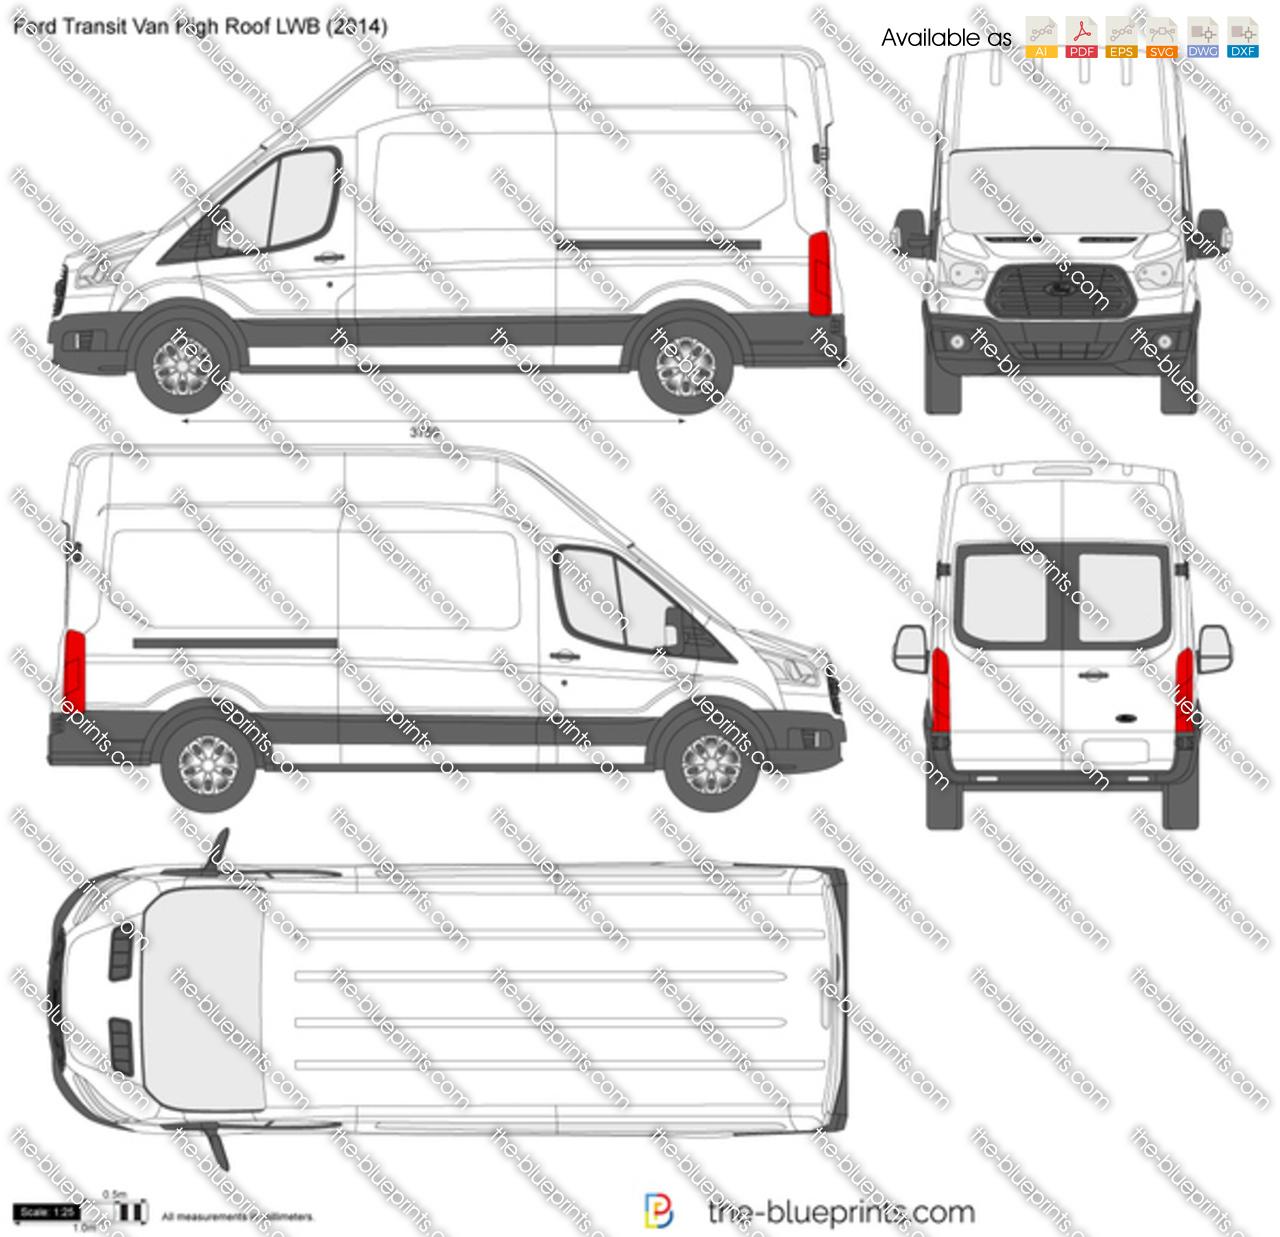 Ford Transit Van High Roof Lwb Vector Drawing